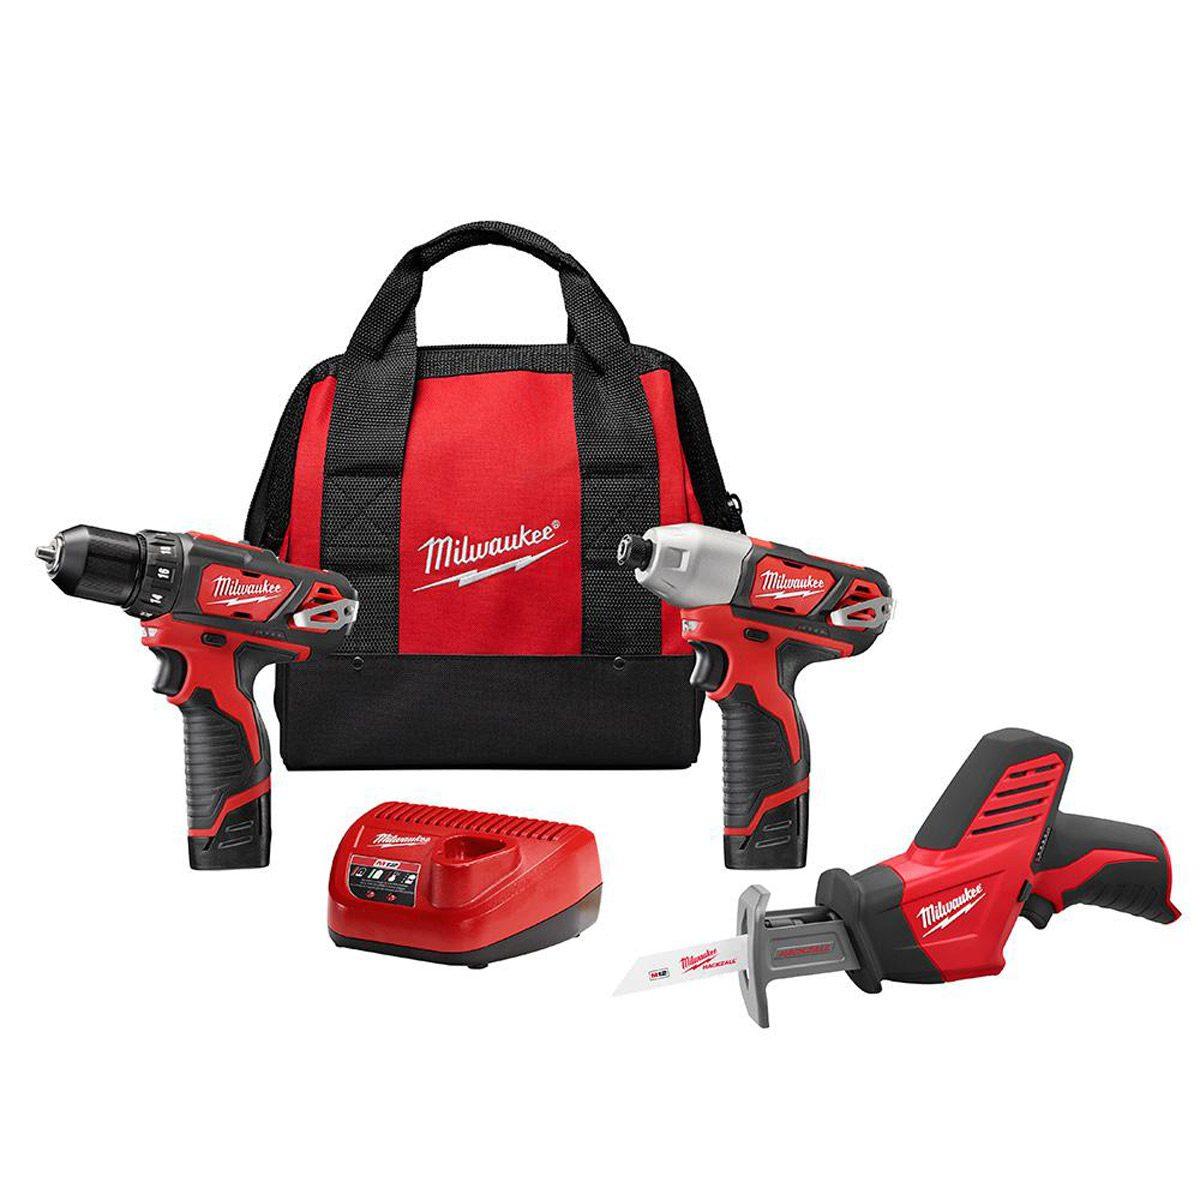 milwaukee cordless power tool kit